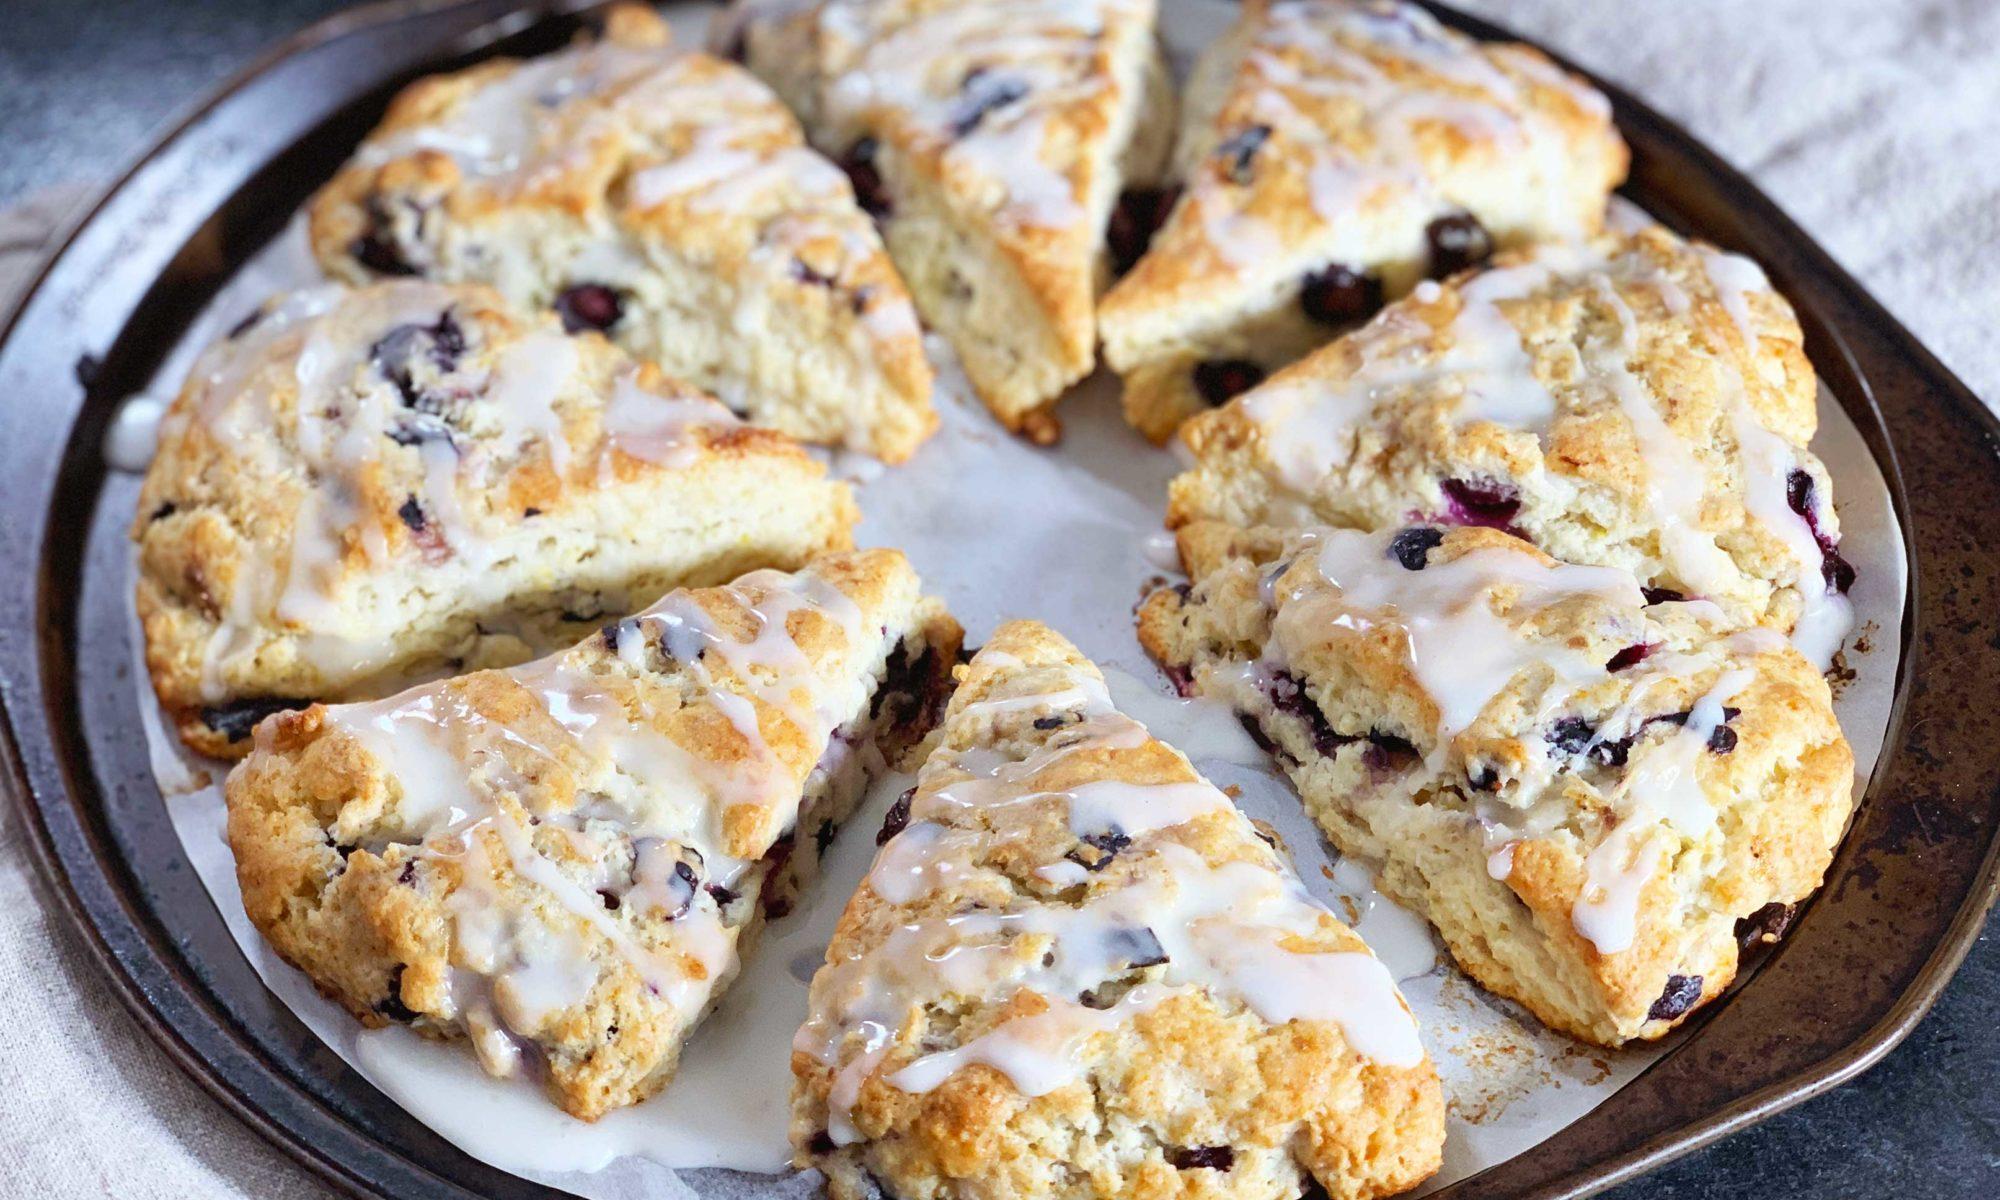 Close up of blueberry lemon scones